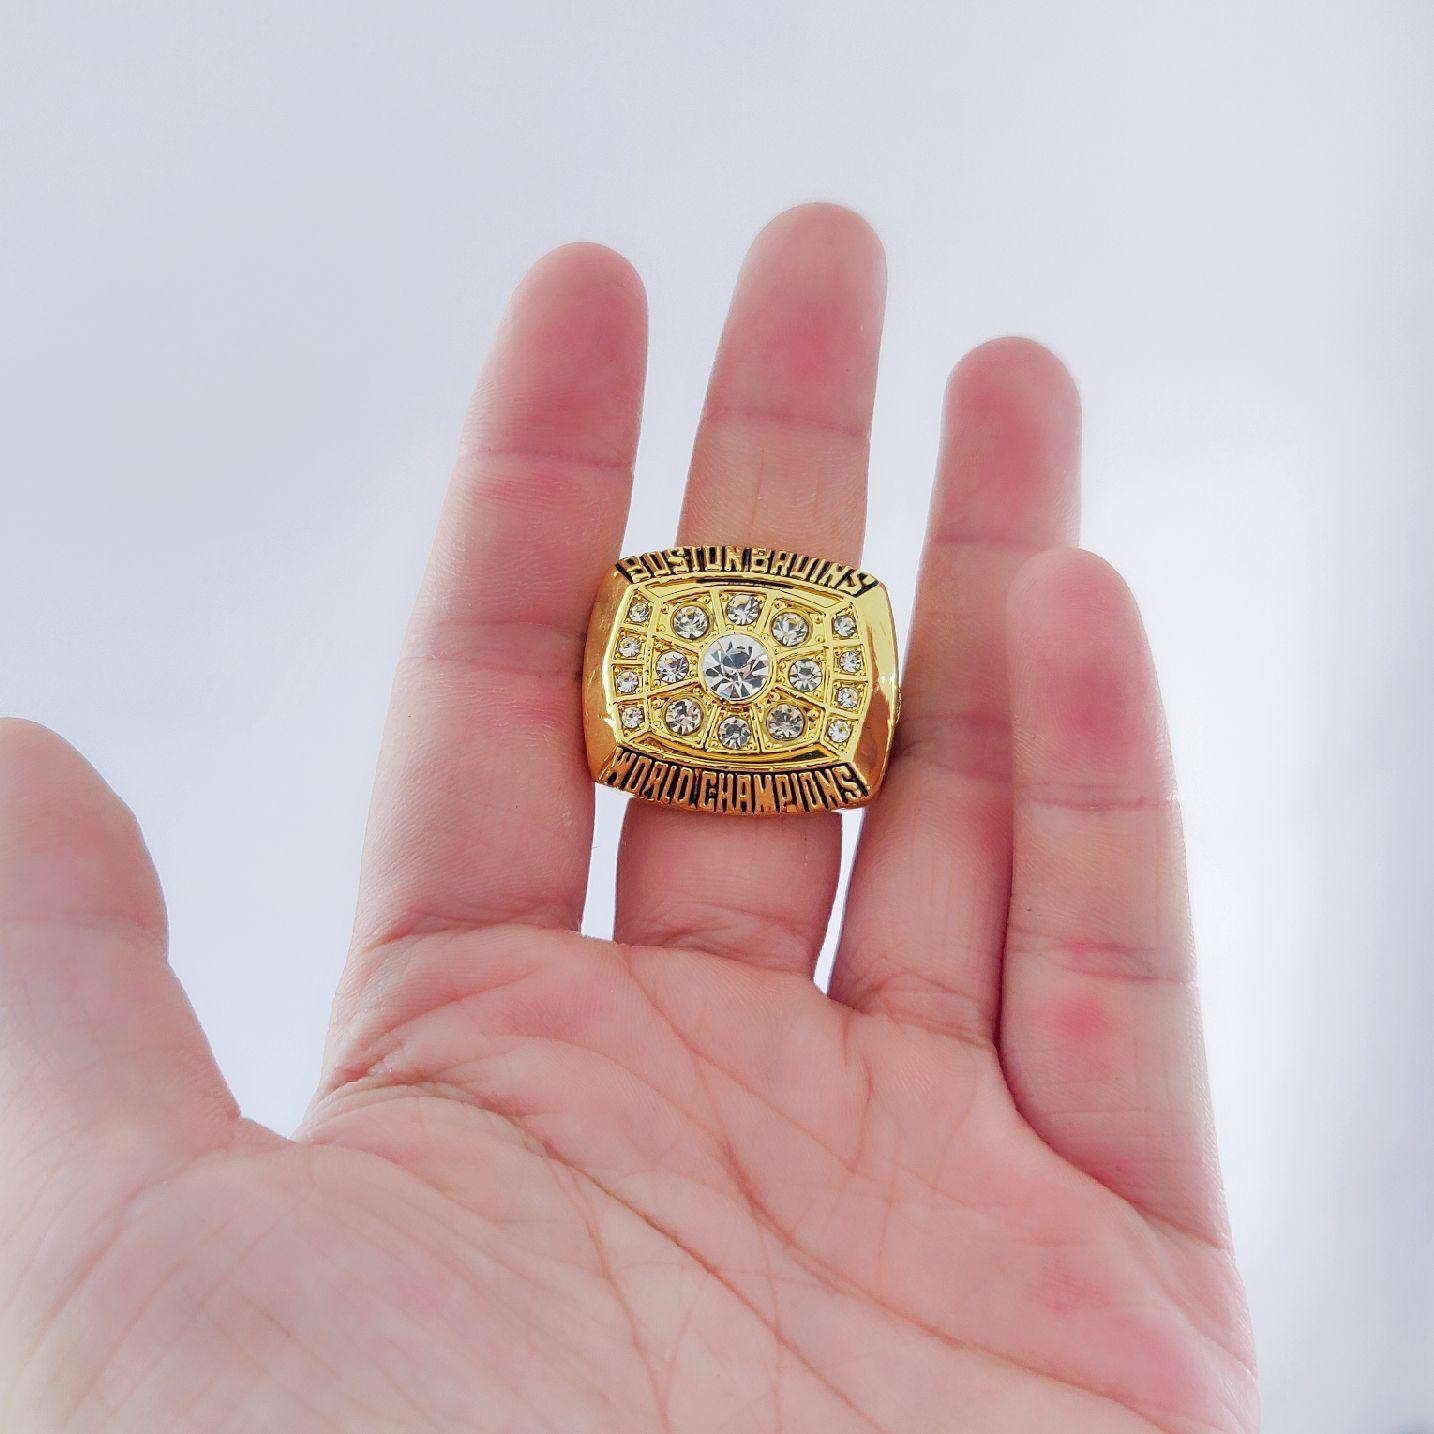 2019 all'ingrosso BOSTON 1972 BRUINS STANLEY CUP CHAMPIONSHIP RING Souvenir Men Fan regalo Drop Shipping